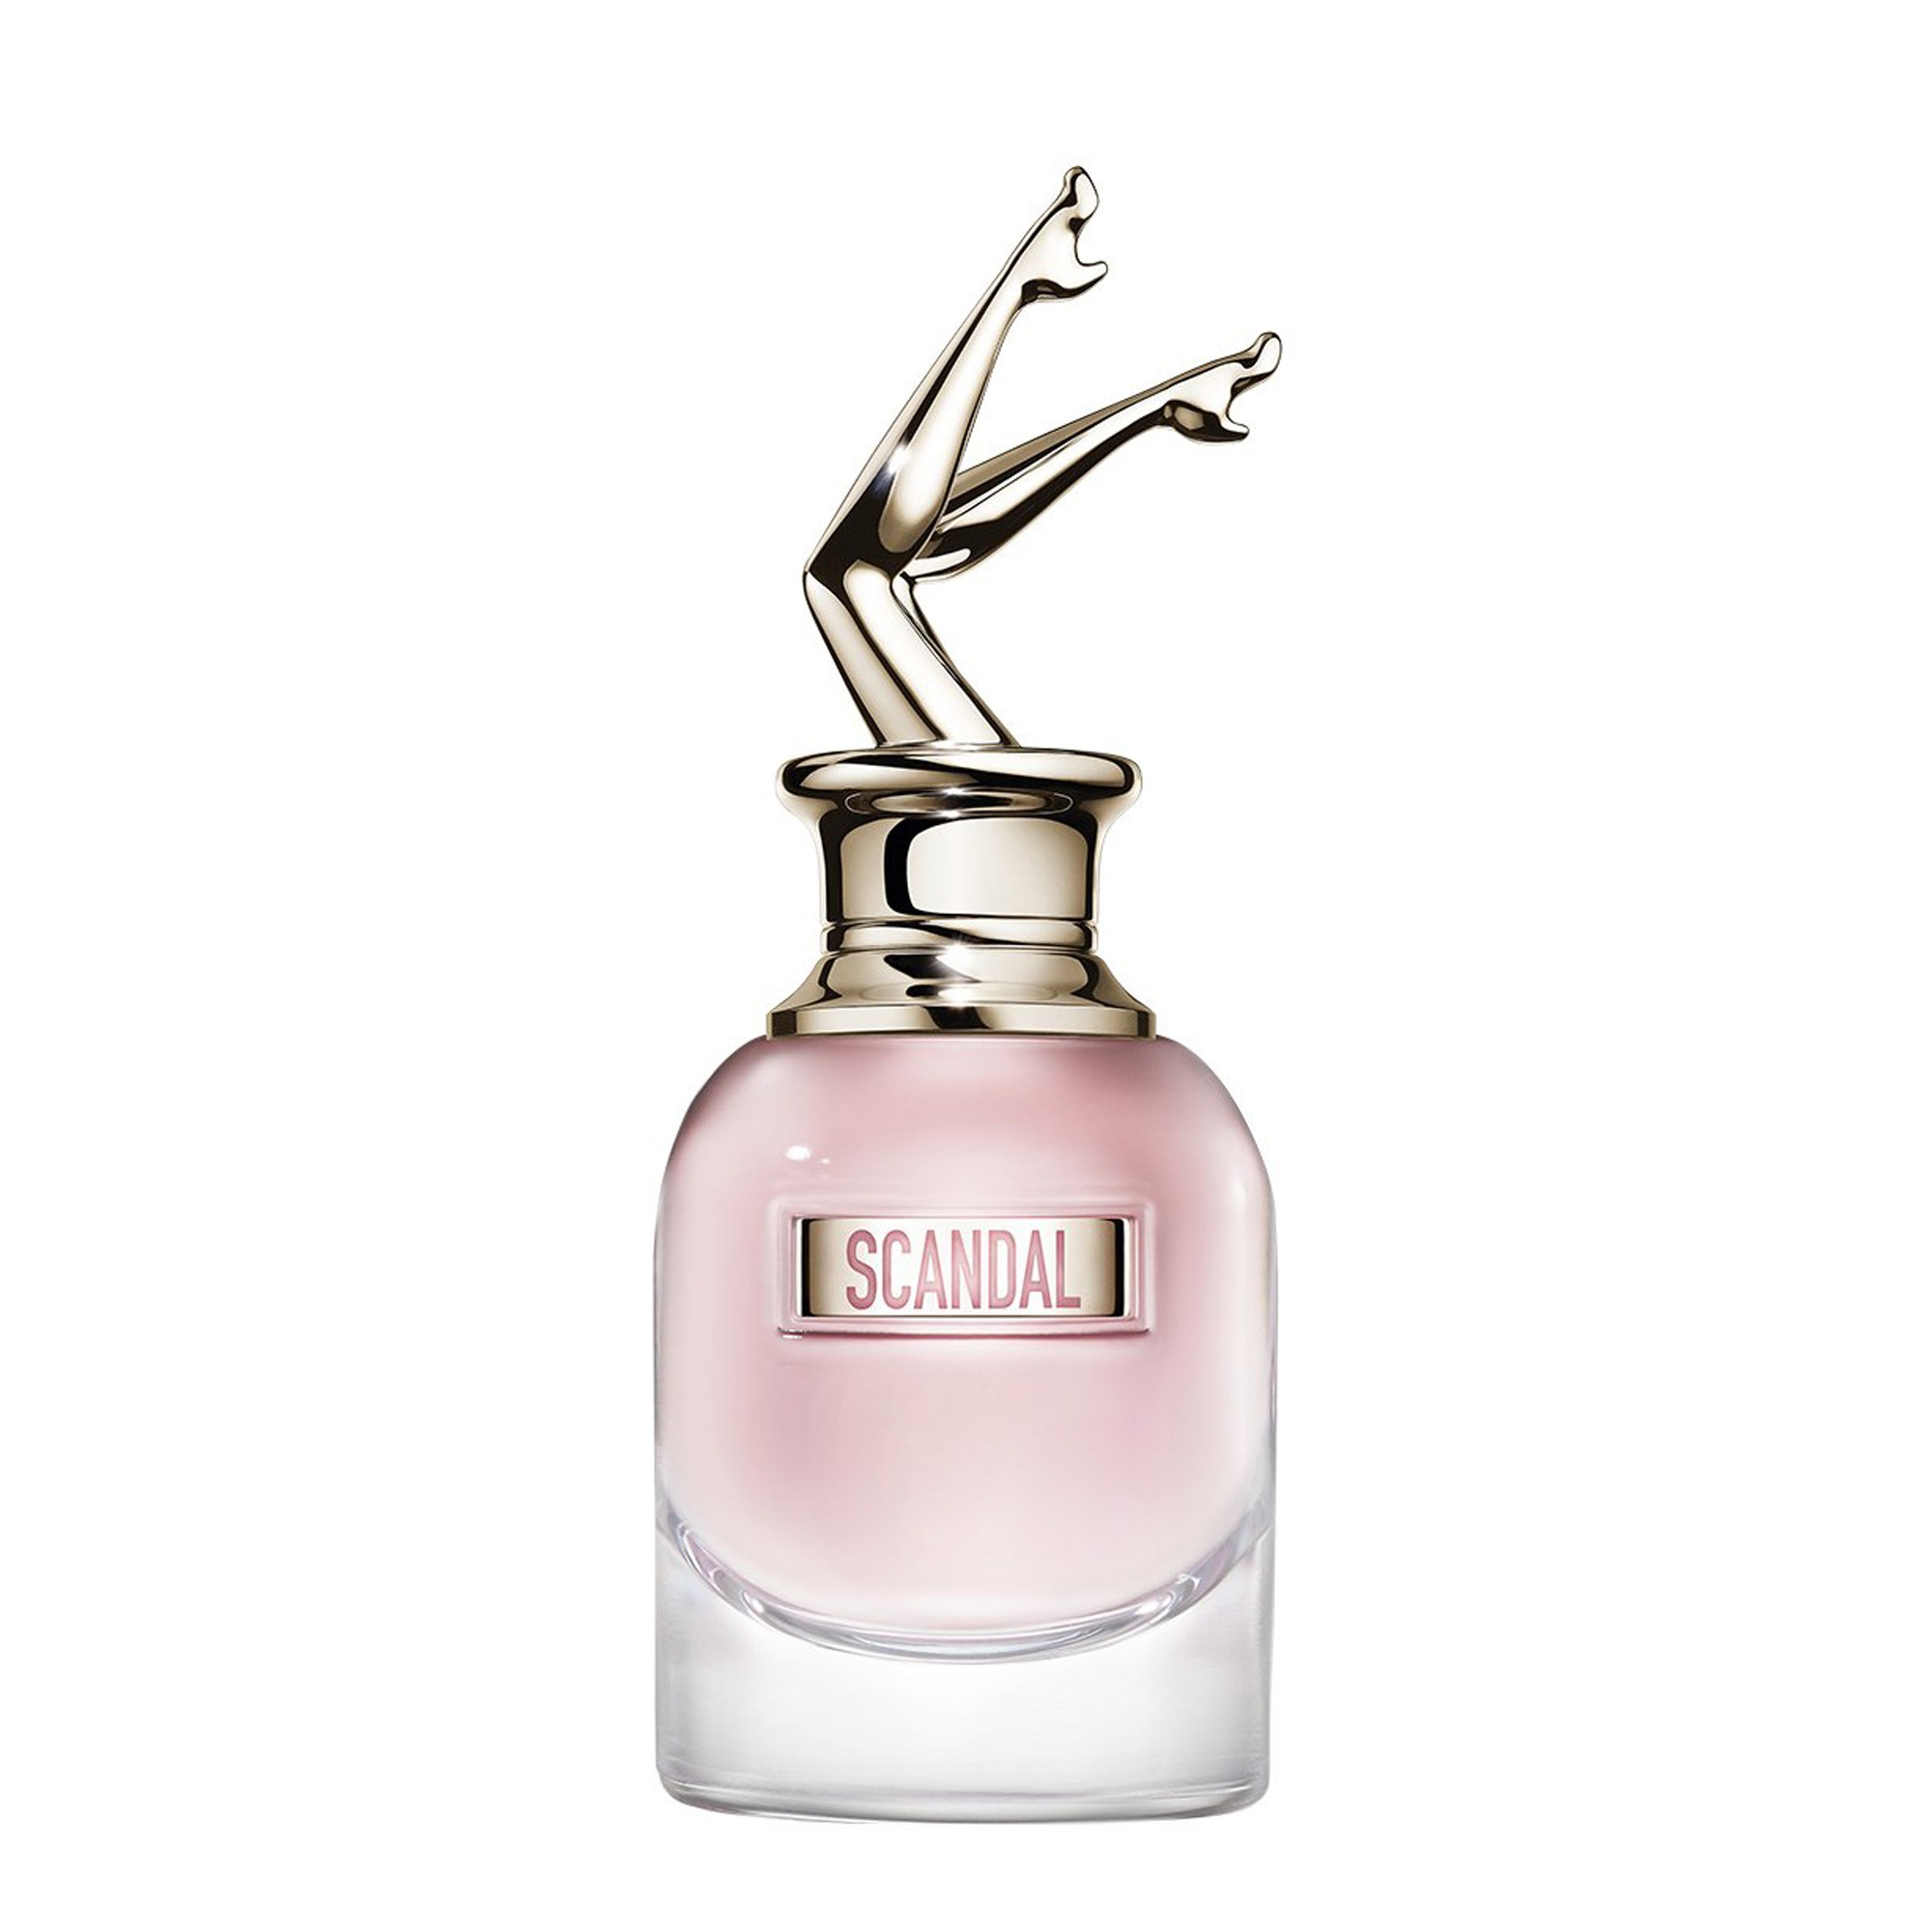 Perfume Scandal 30 Ml